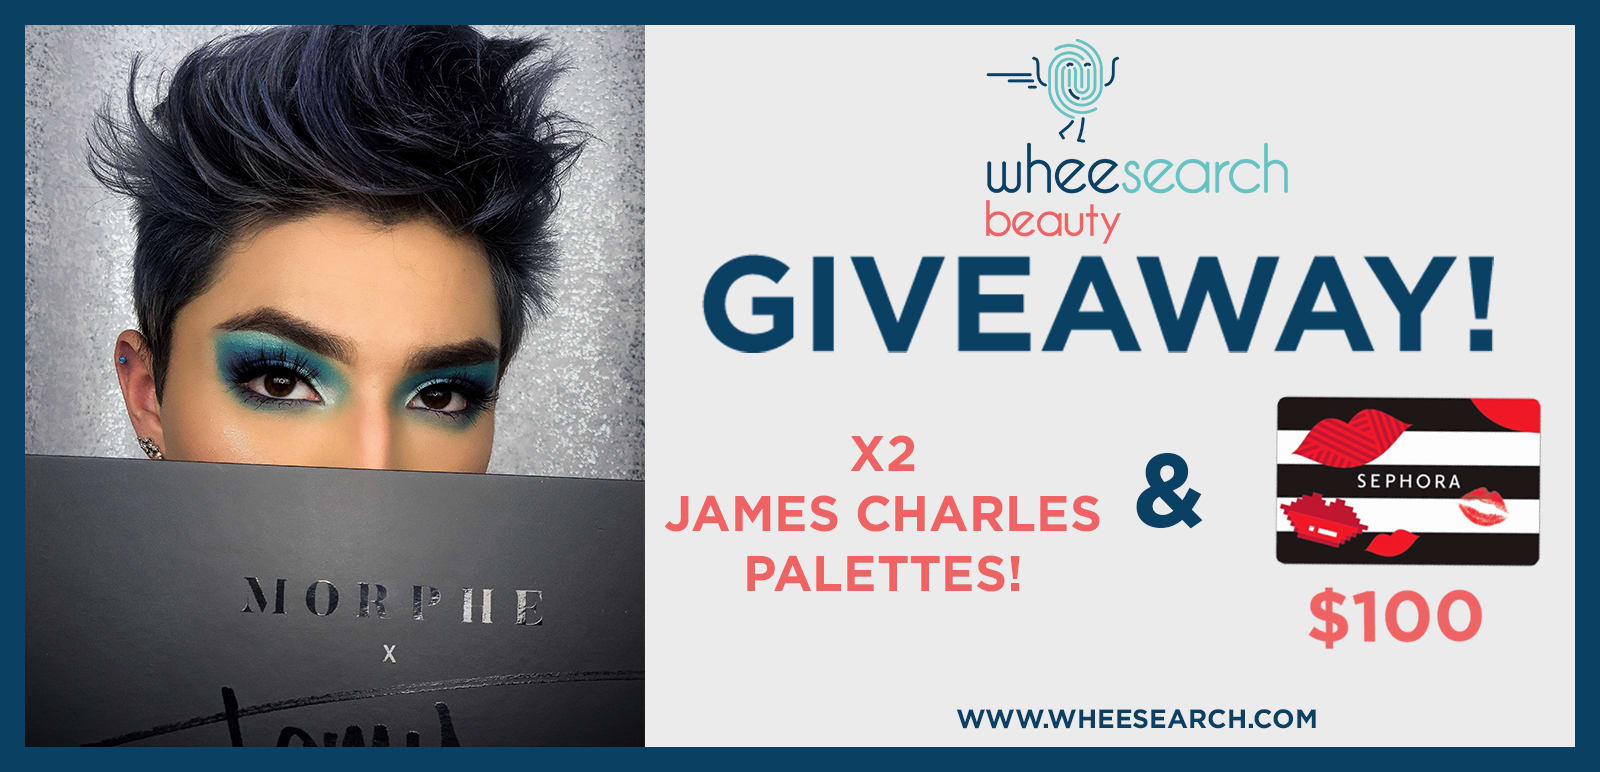 James Charles X Morphe Youtube Giveaway Poshmark makes shopping fun, affordable & easy! james charles x morphe youtube giveaway